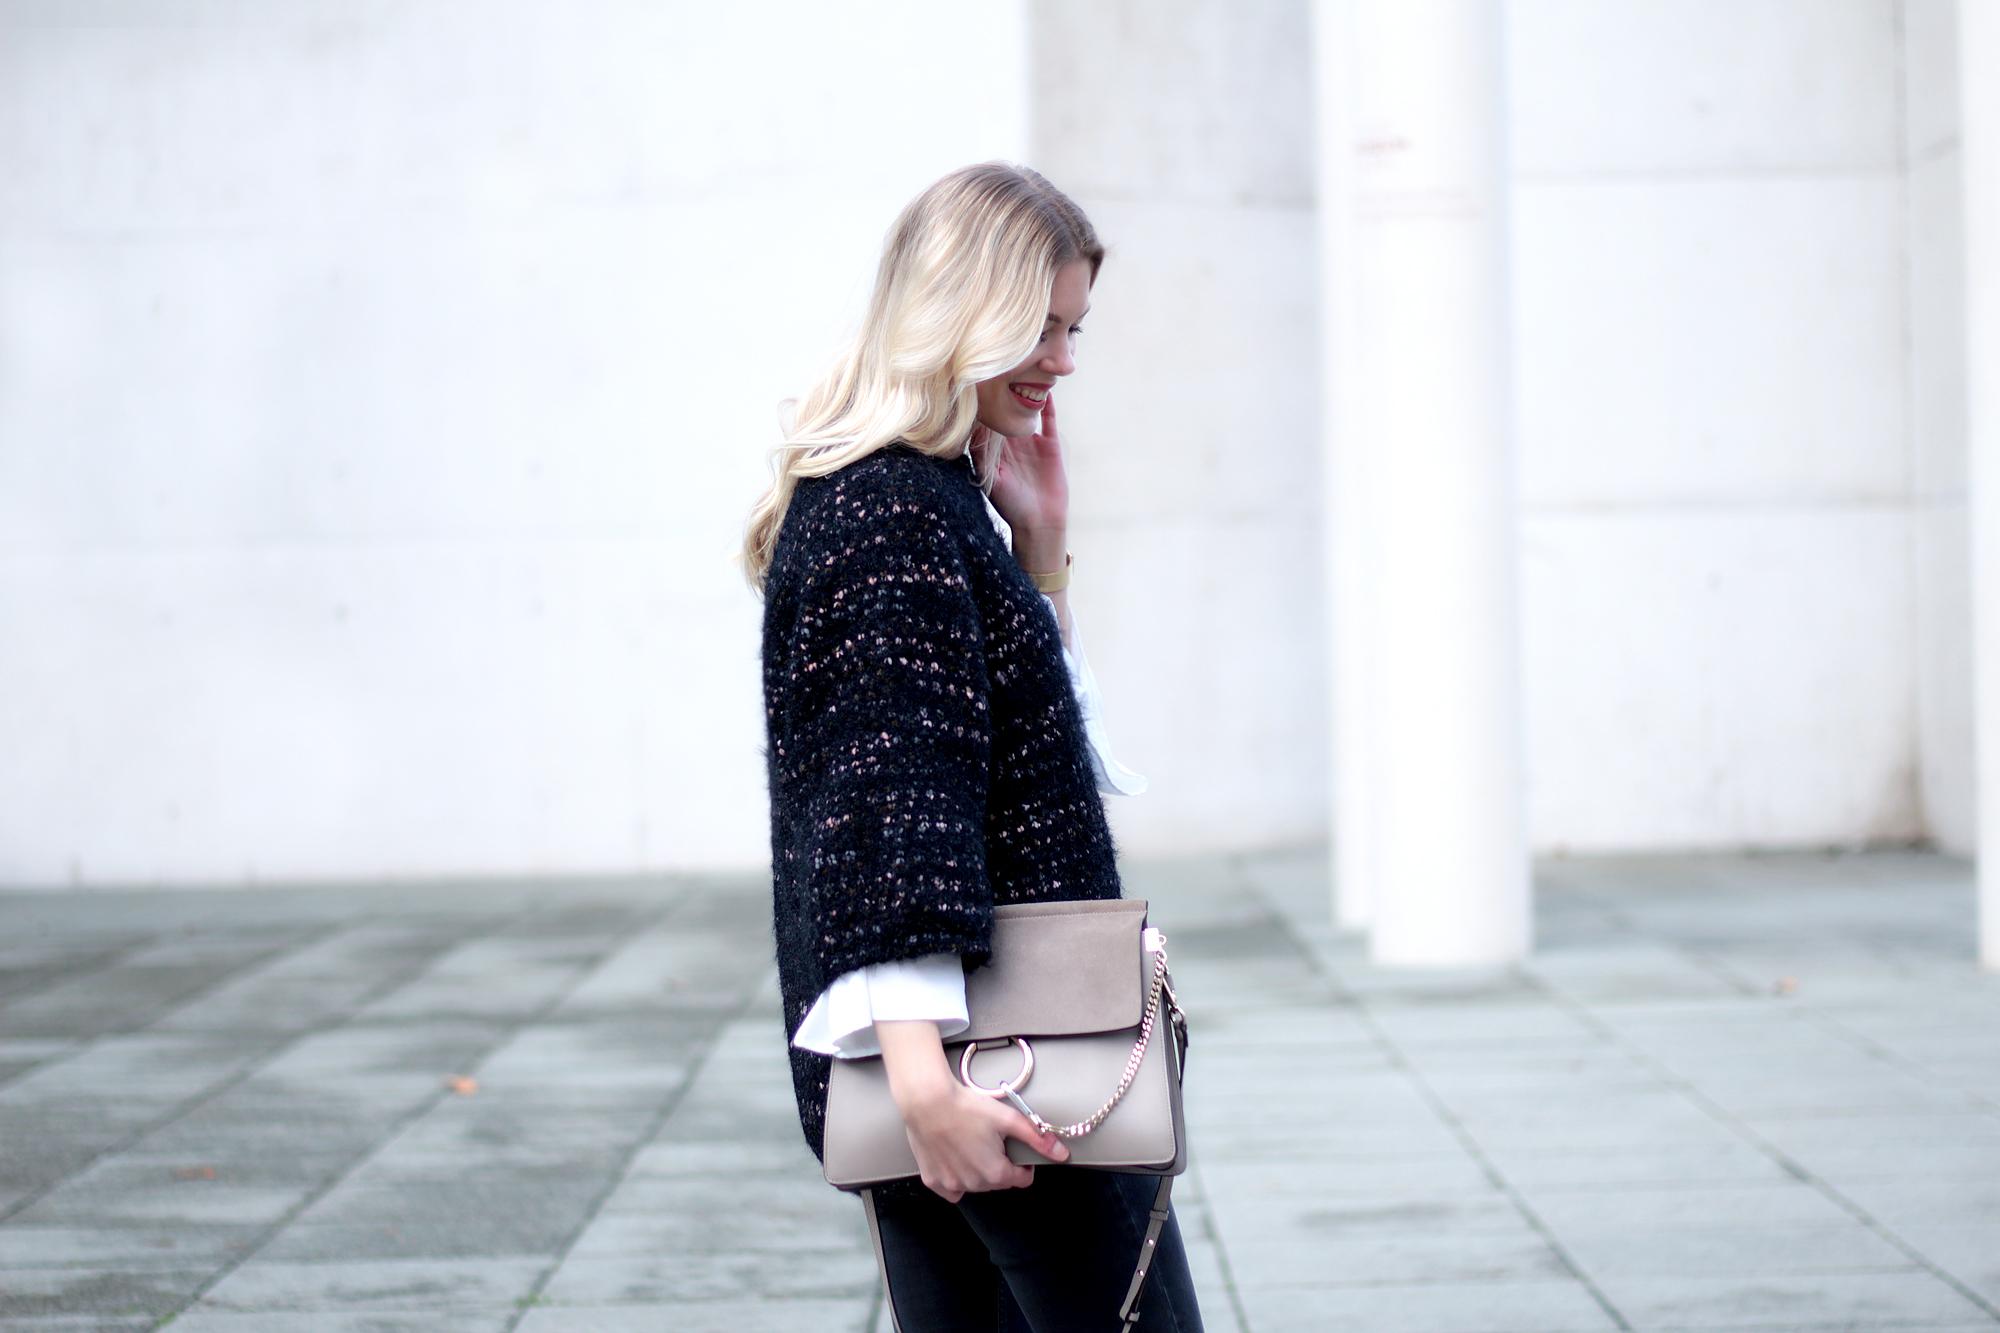 verenajulia_somehappyshoes_fashionblog_streetstyle_chloe_faye_bag_bonn